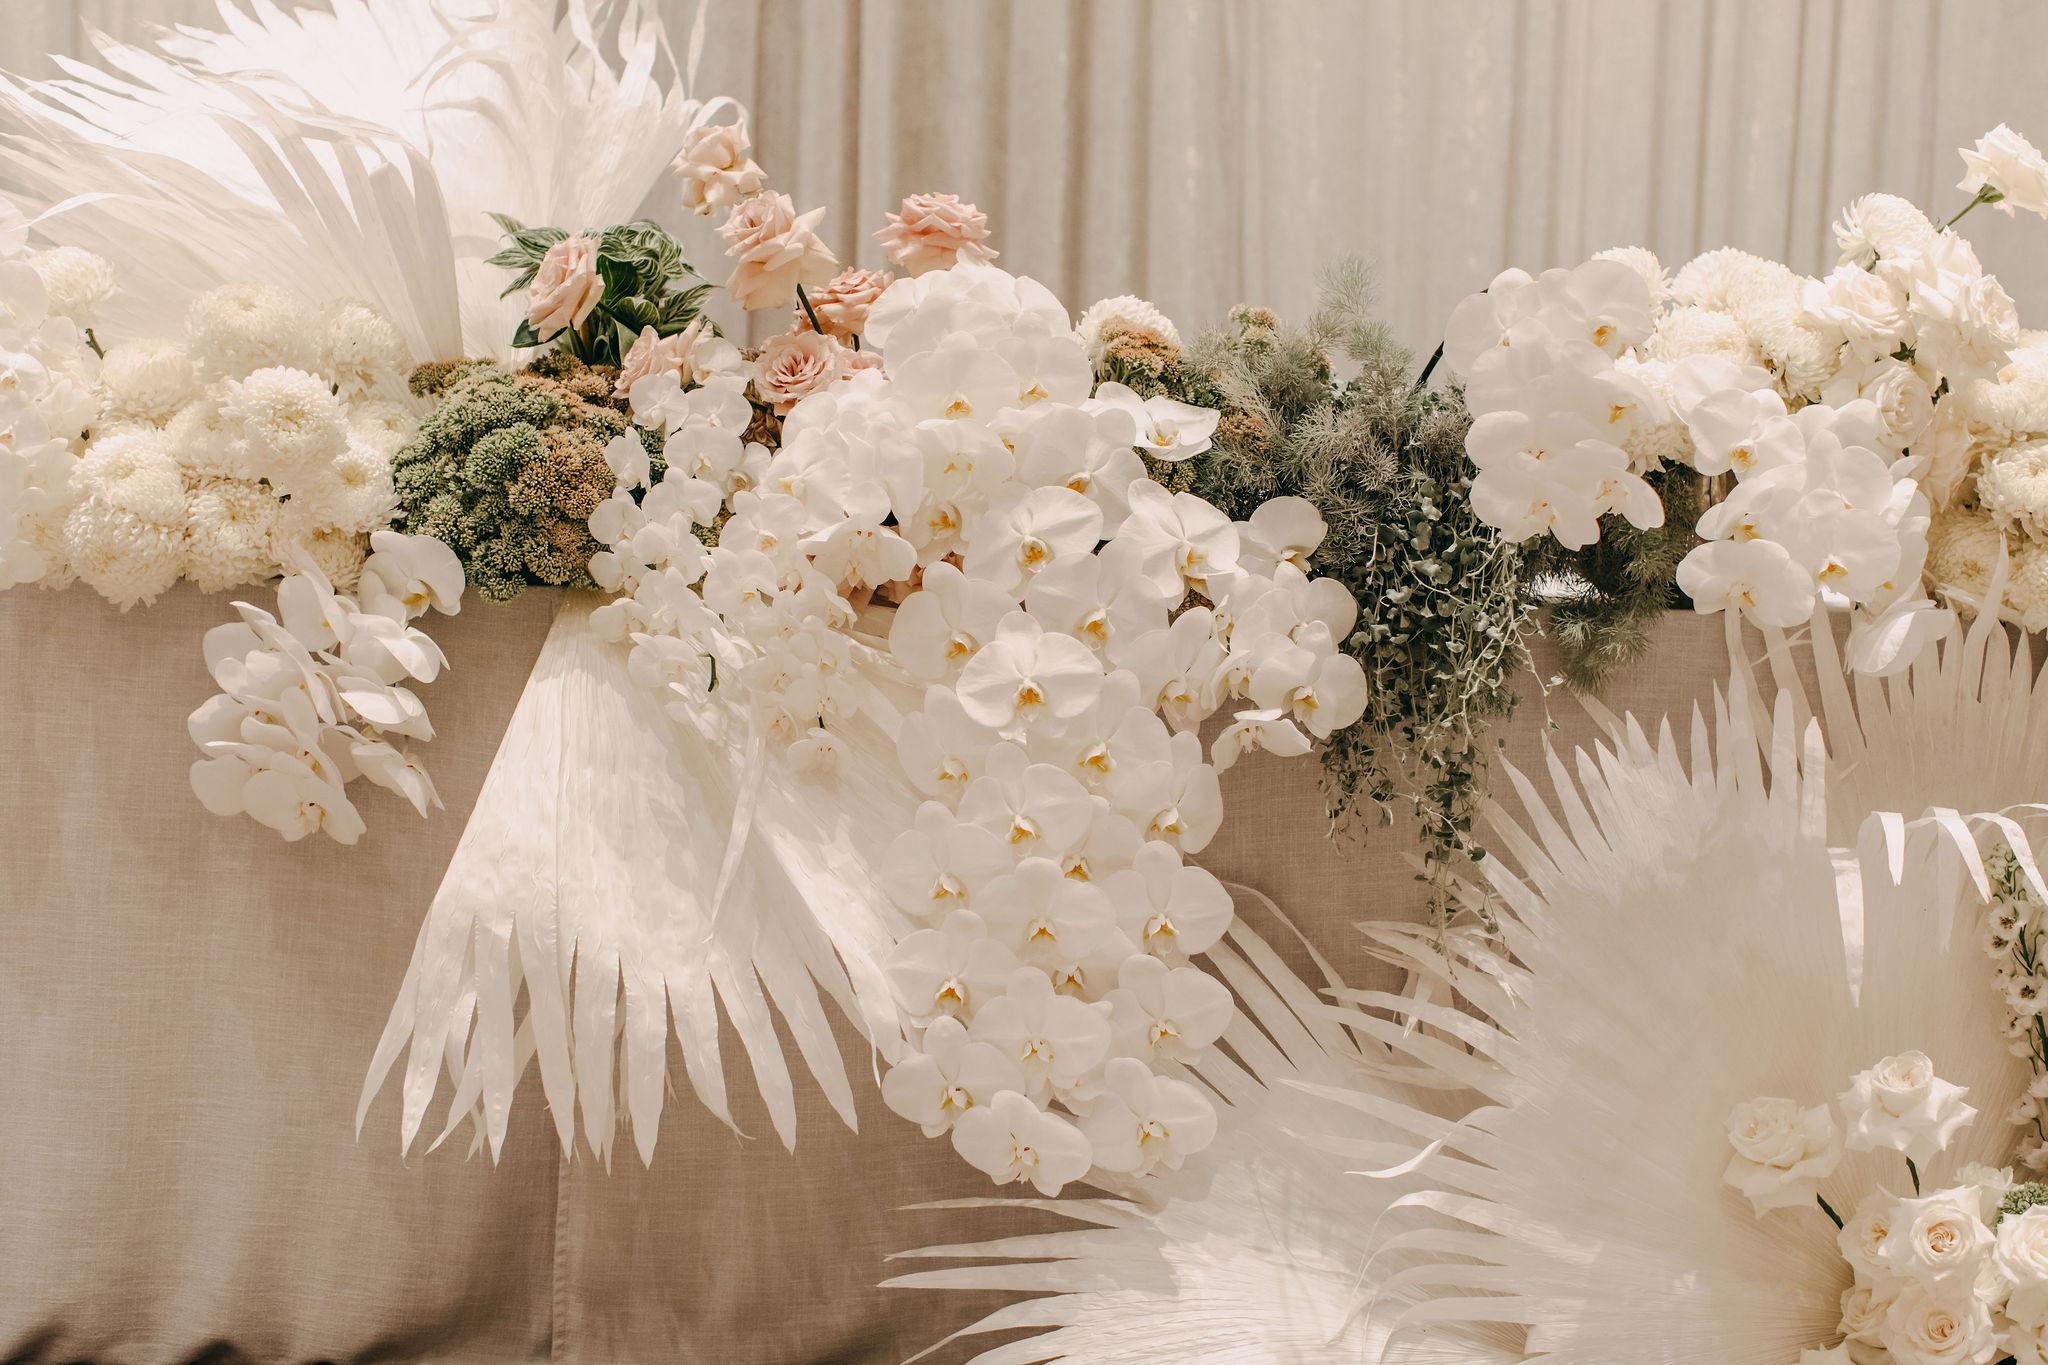 23-FOX&RABBIT-WEDDINGOPENDAY-THEWESTIN-15FEB2020